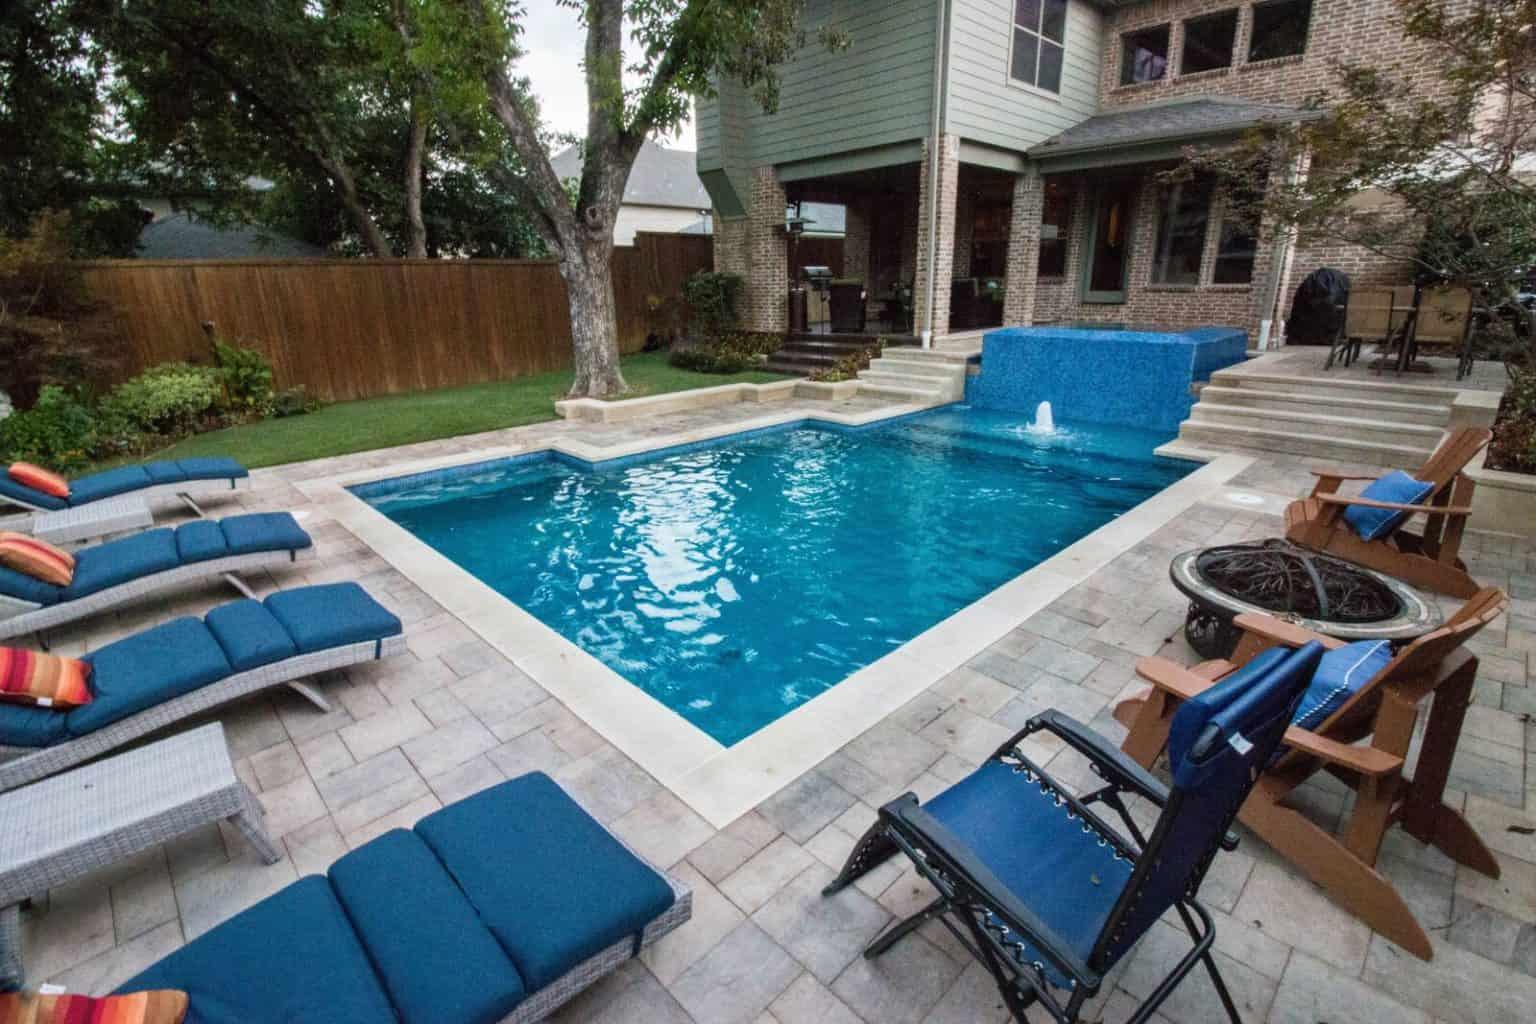 Pool with Raised 360 Degree Negative Edge Spa | Summerhill ... on Modern Backyard Ideas With Pool id=43303